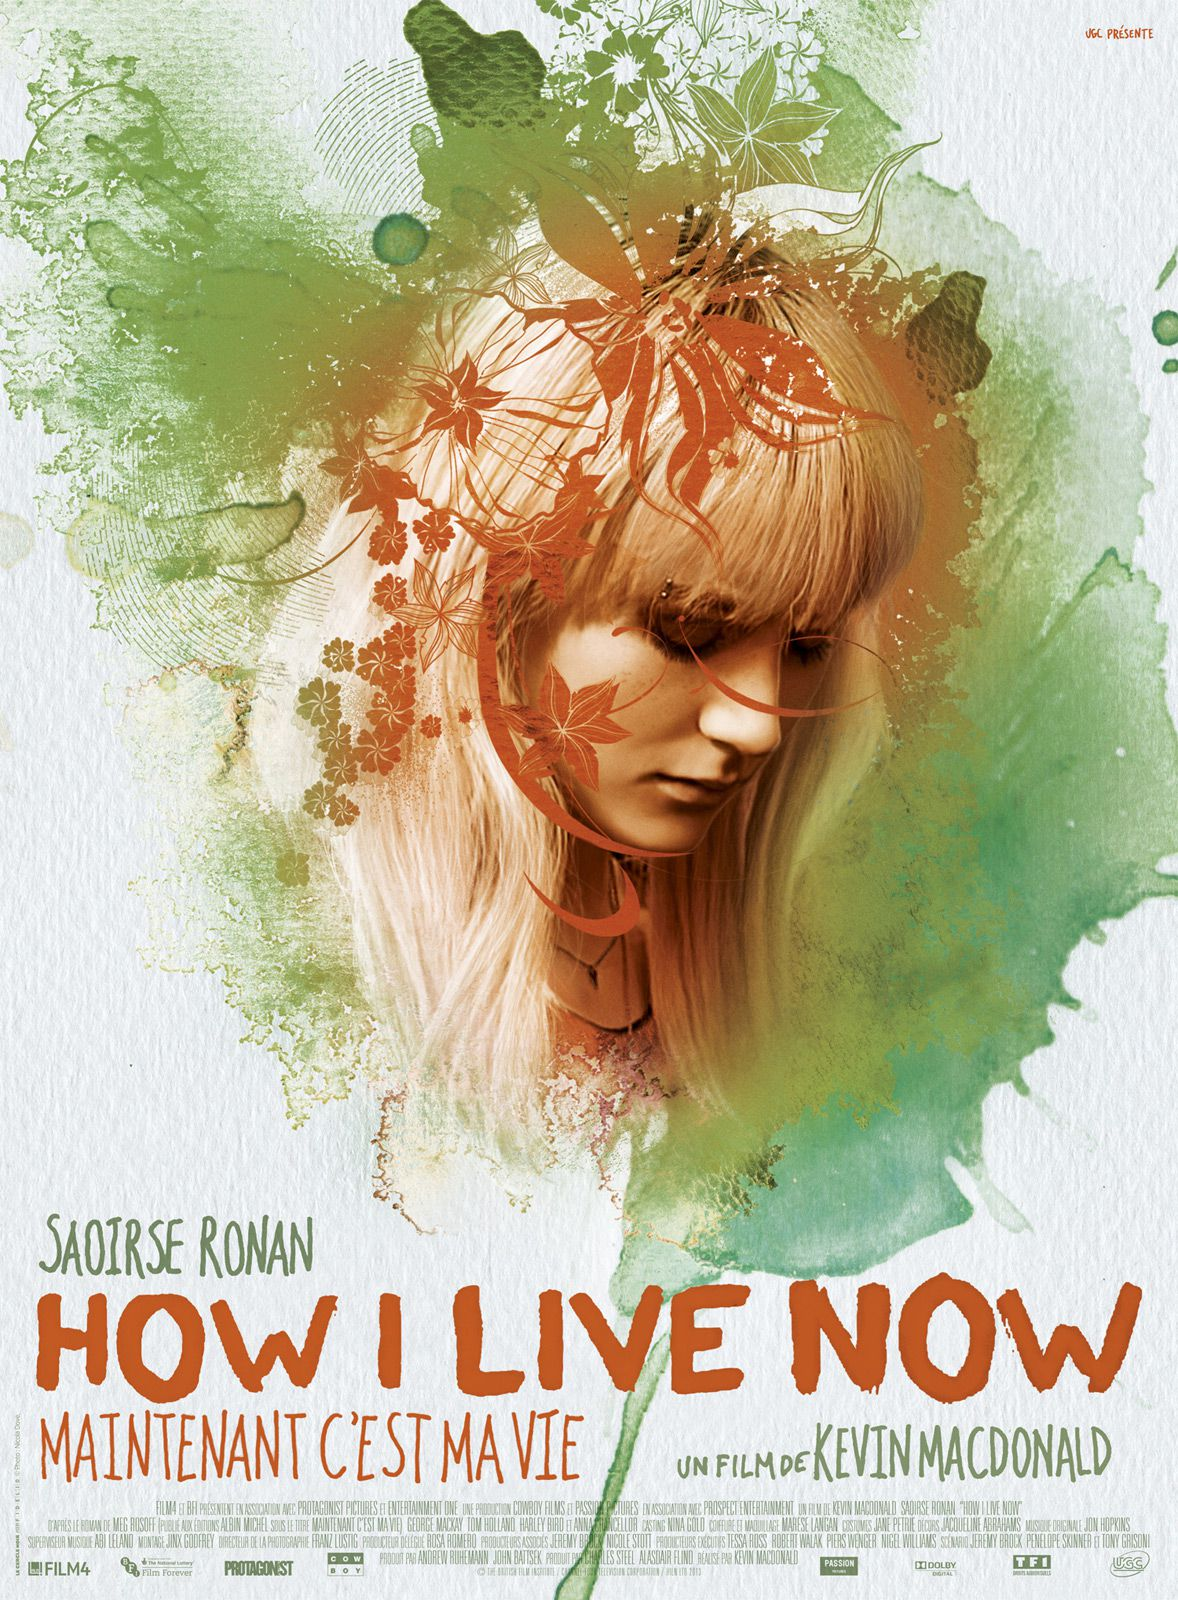 How I Live Now (Maintenant c'est ma vie) - Film (2013)